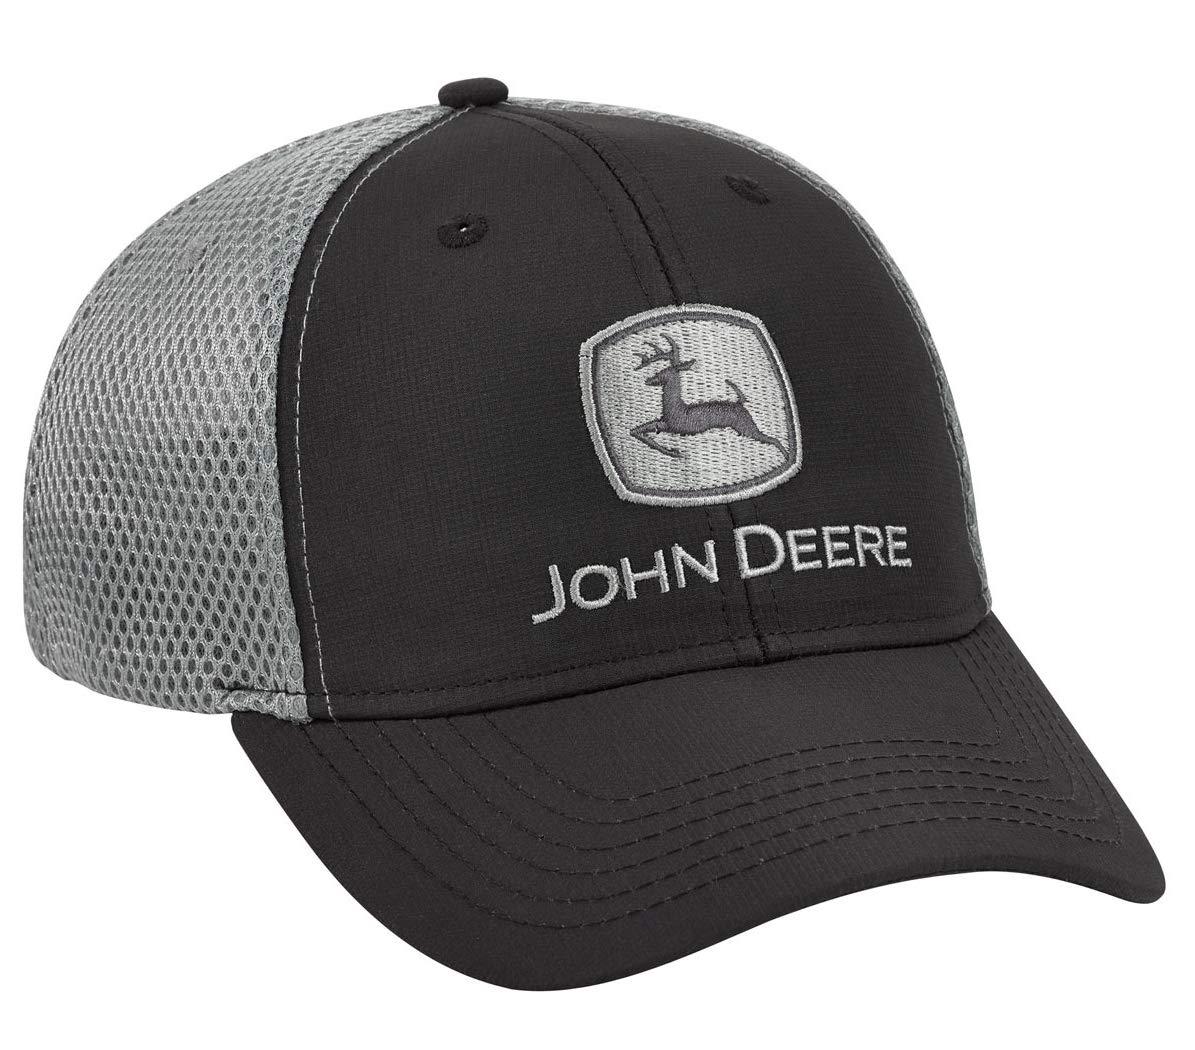 John Deere Black/Gray Stretch Fit Cap - LP69230